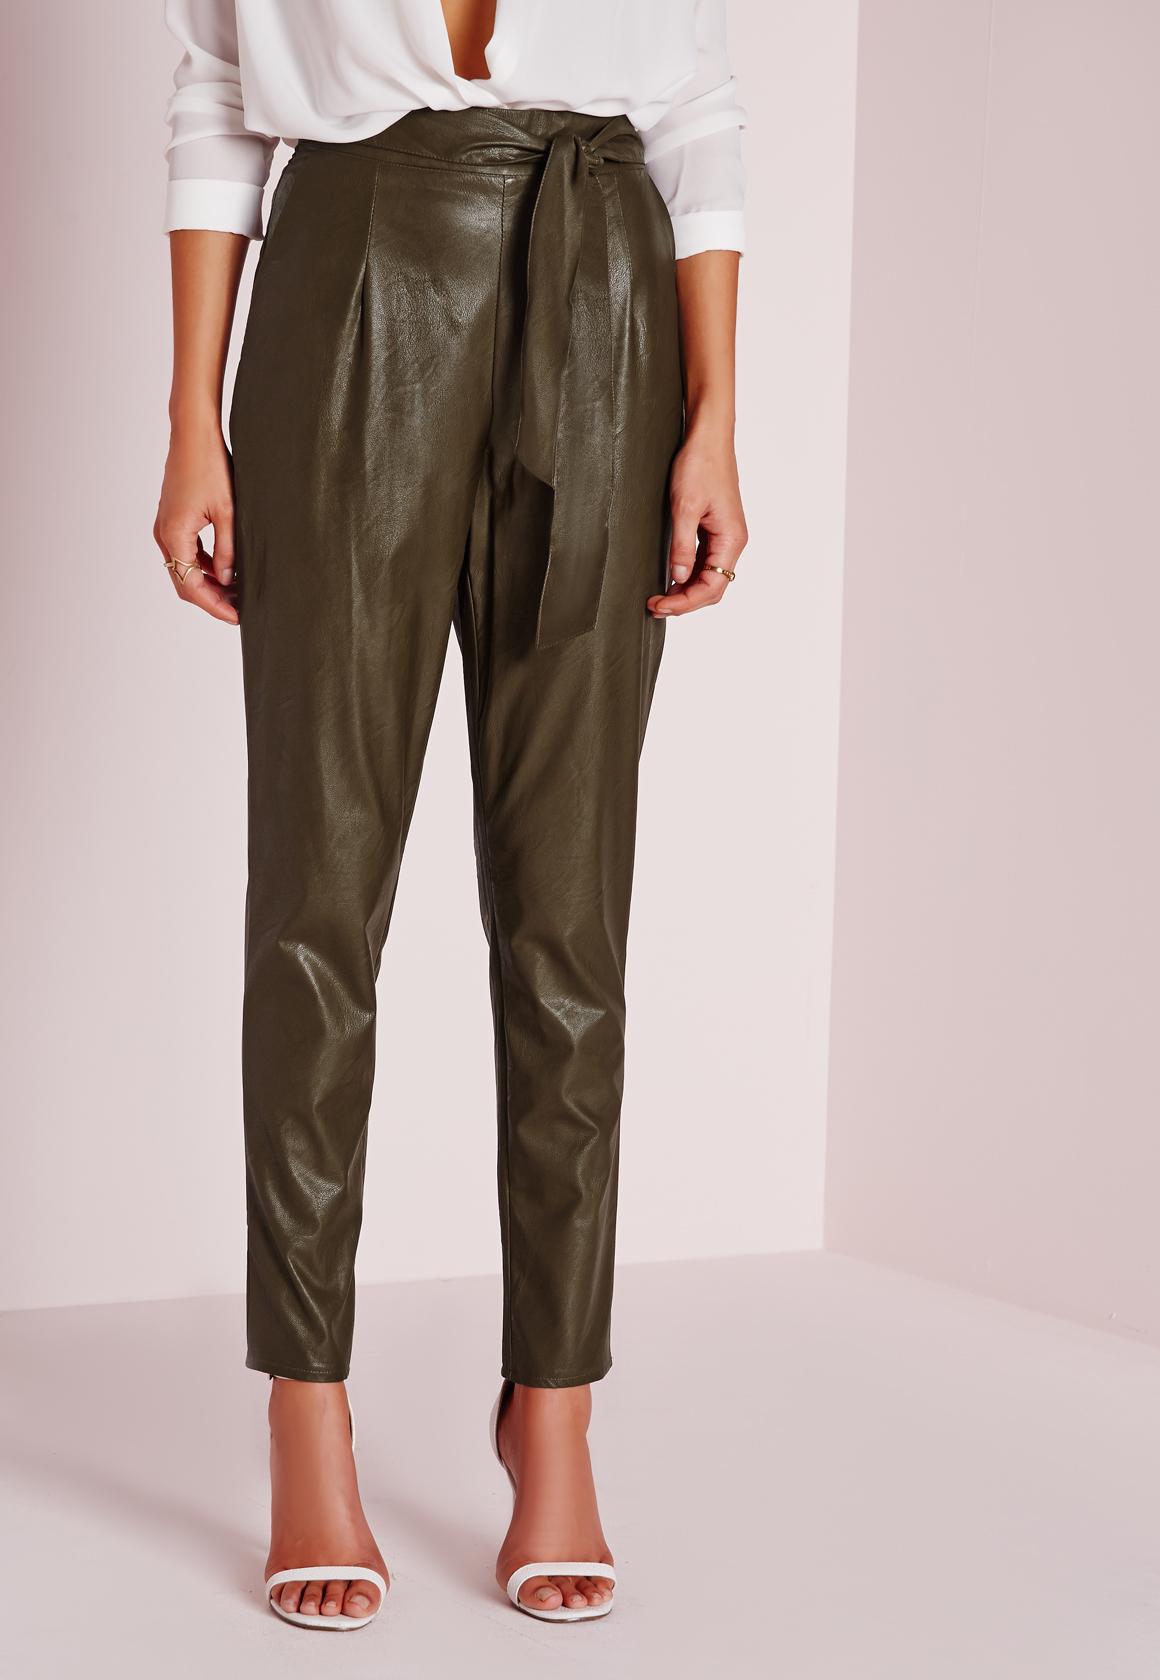 Missguided Tie Waist Faux Leather Pegged Leg Pants Khaki